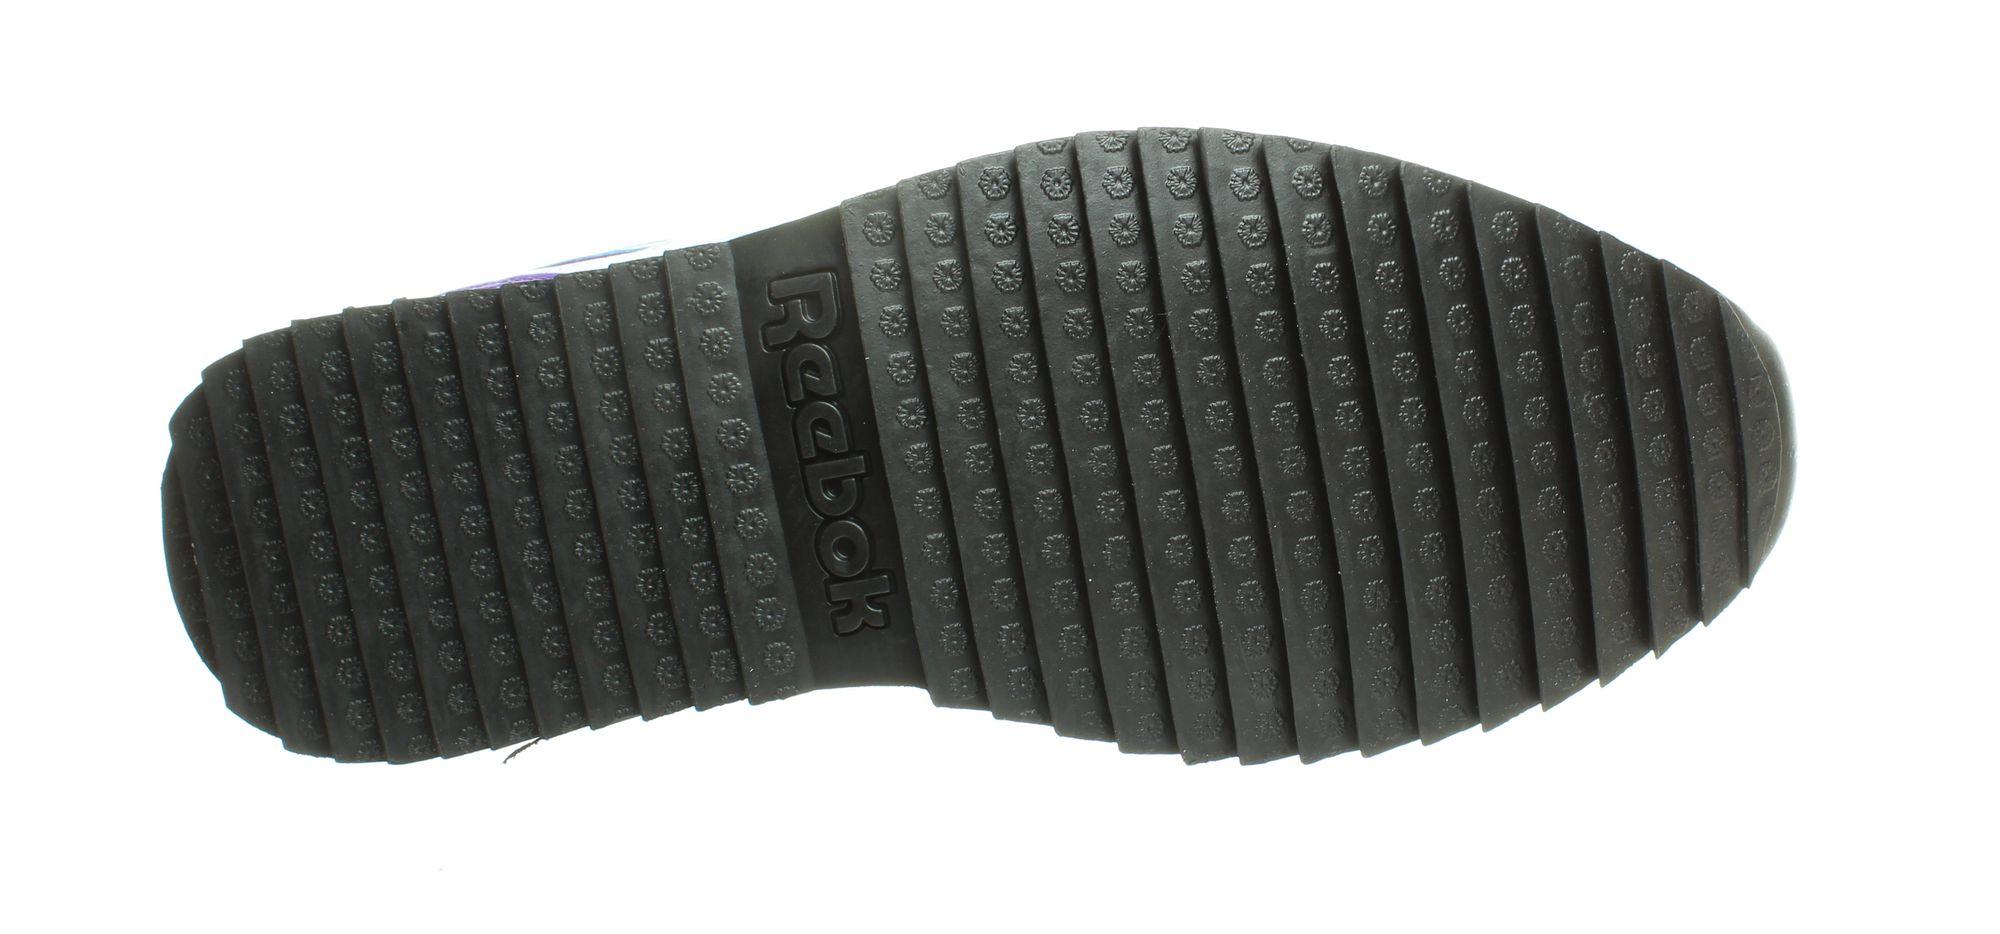 Reebok-Mens-Classic-Leather-Ripple-Fashion-Sneakers thumbnail 21